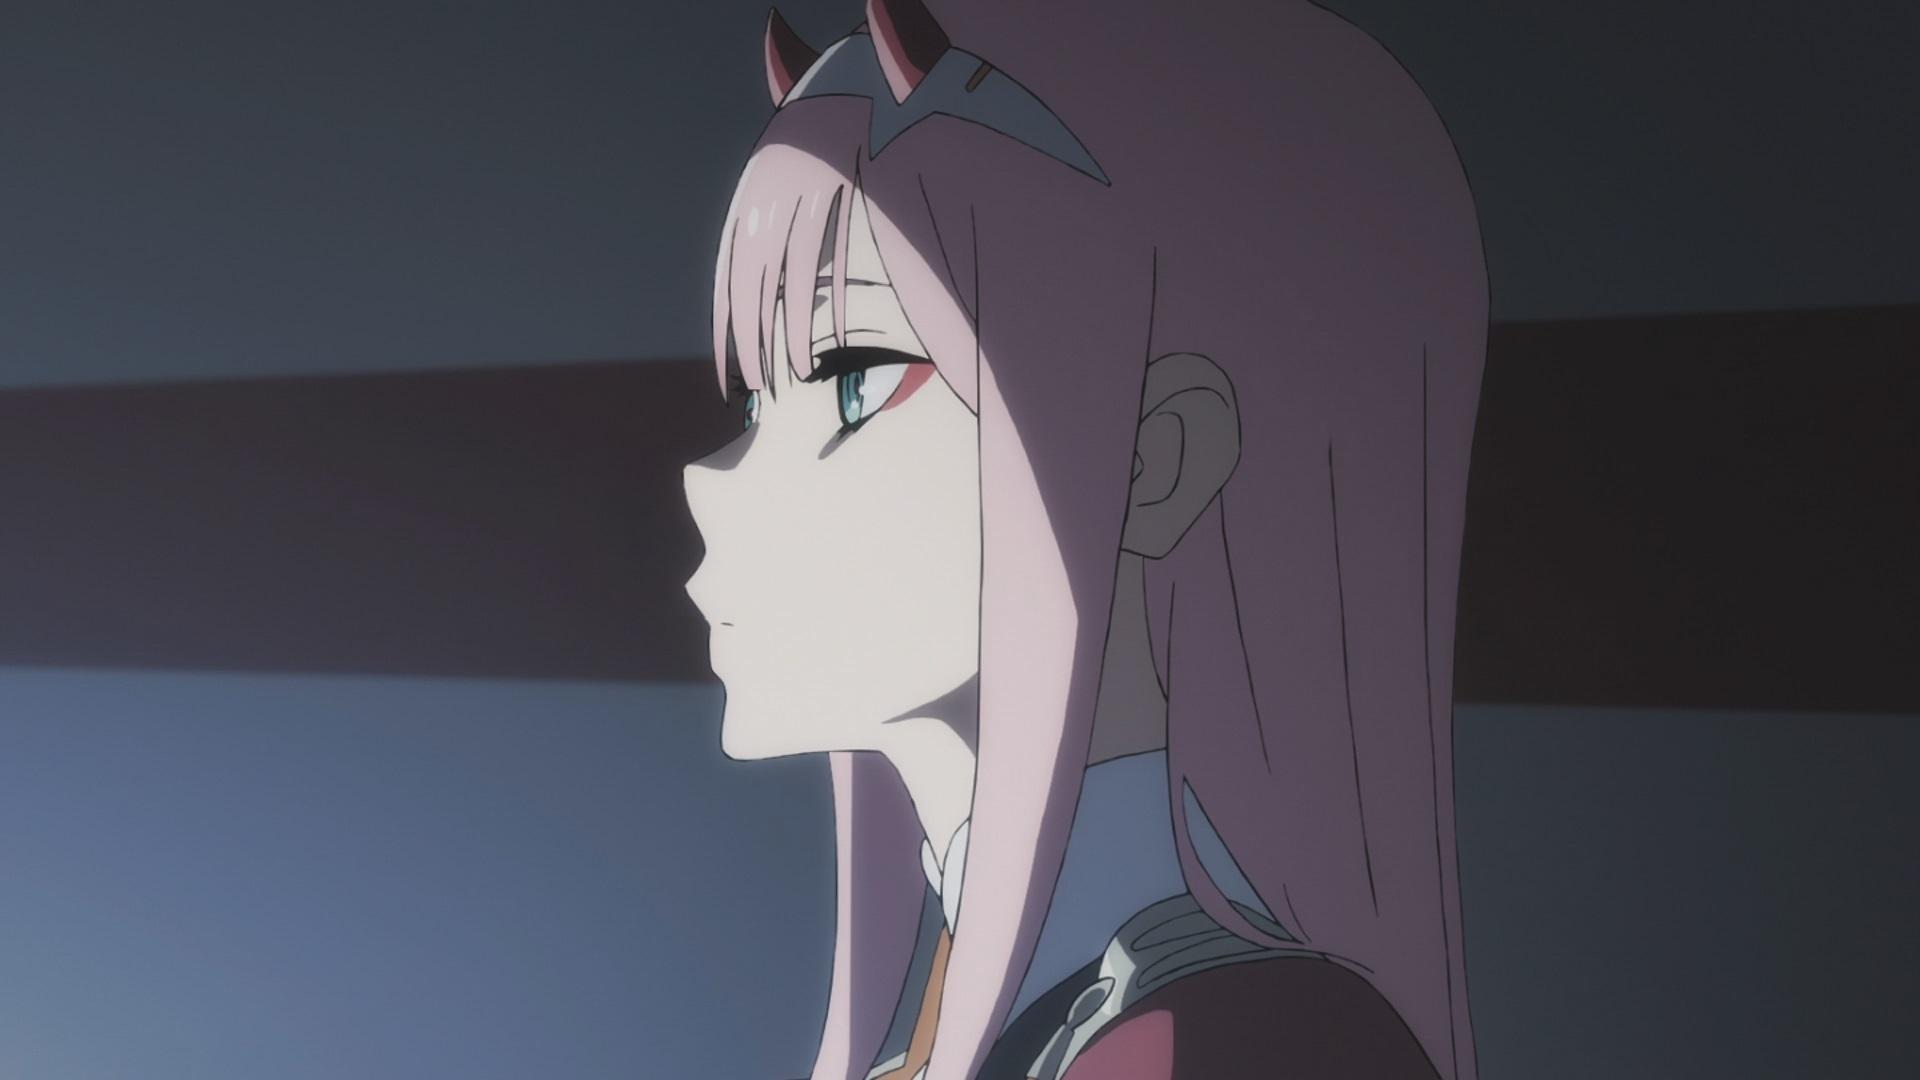 Papel de parede : Anime, Meninas anime, Darling in the FranXX